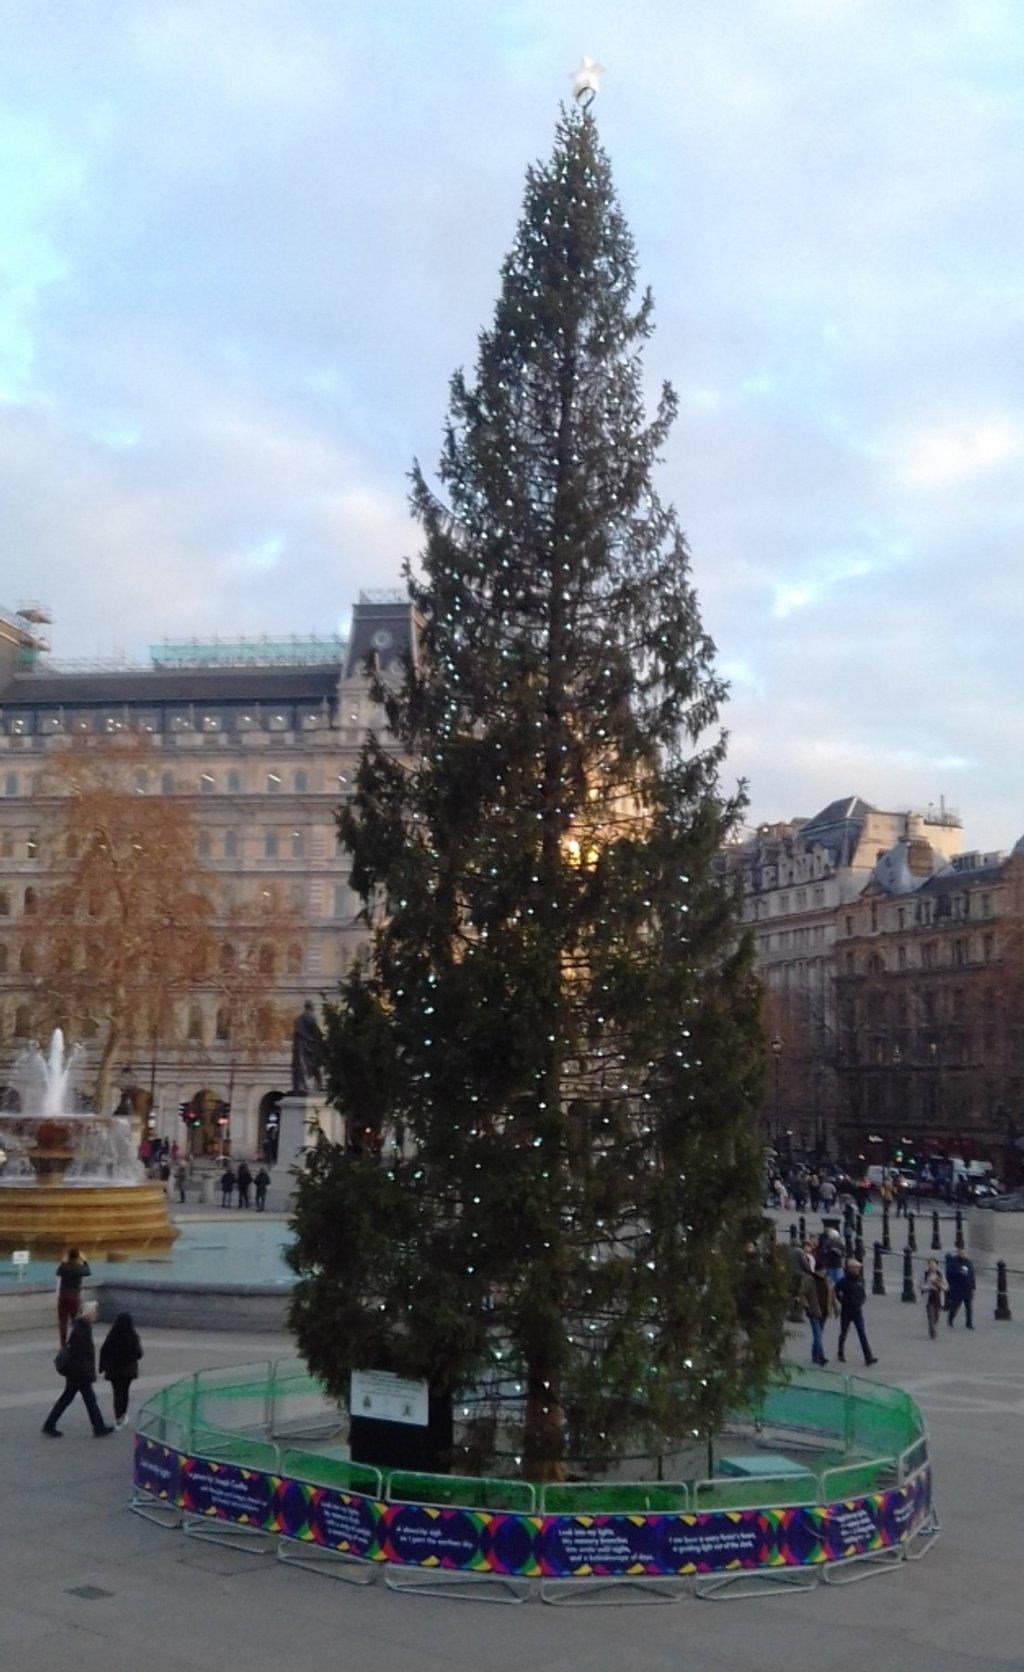 Tall Trafalgar Tree by will_wooderson